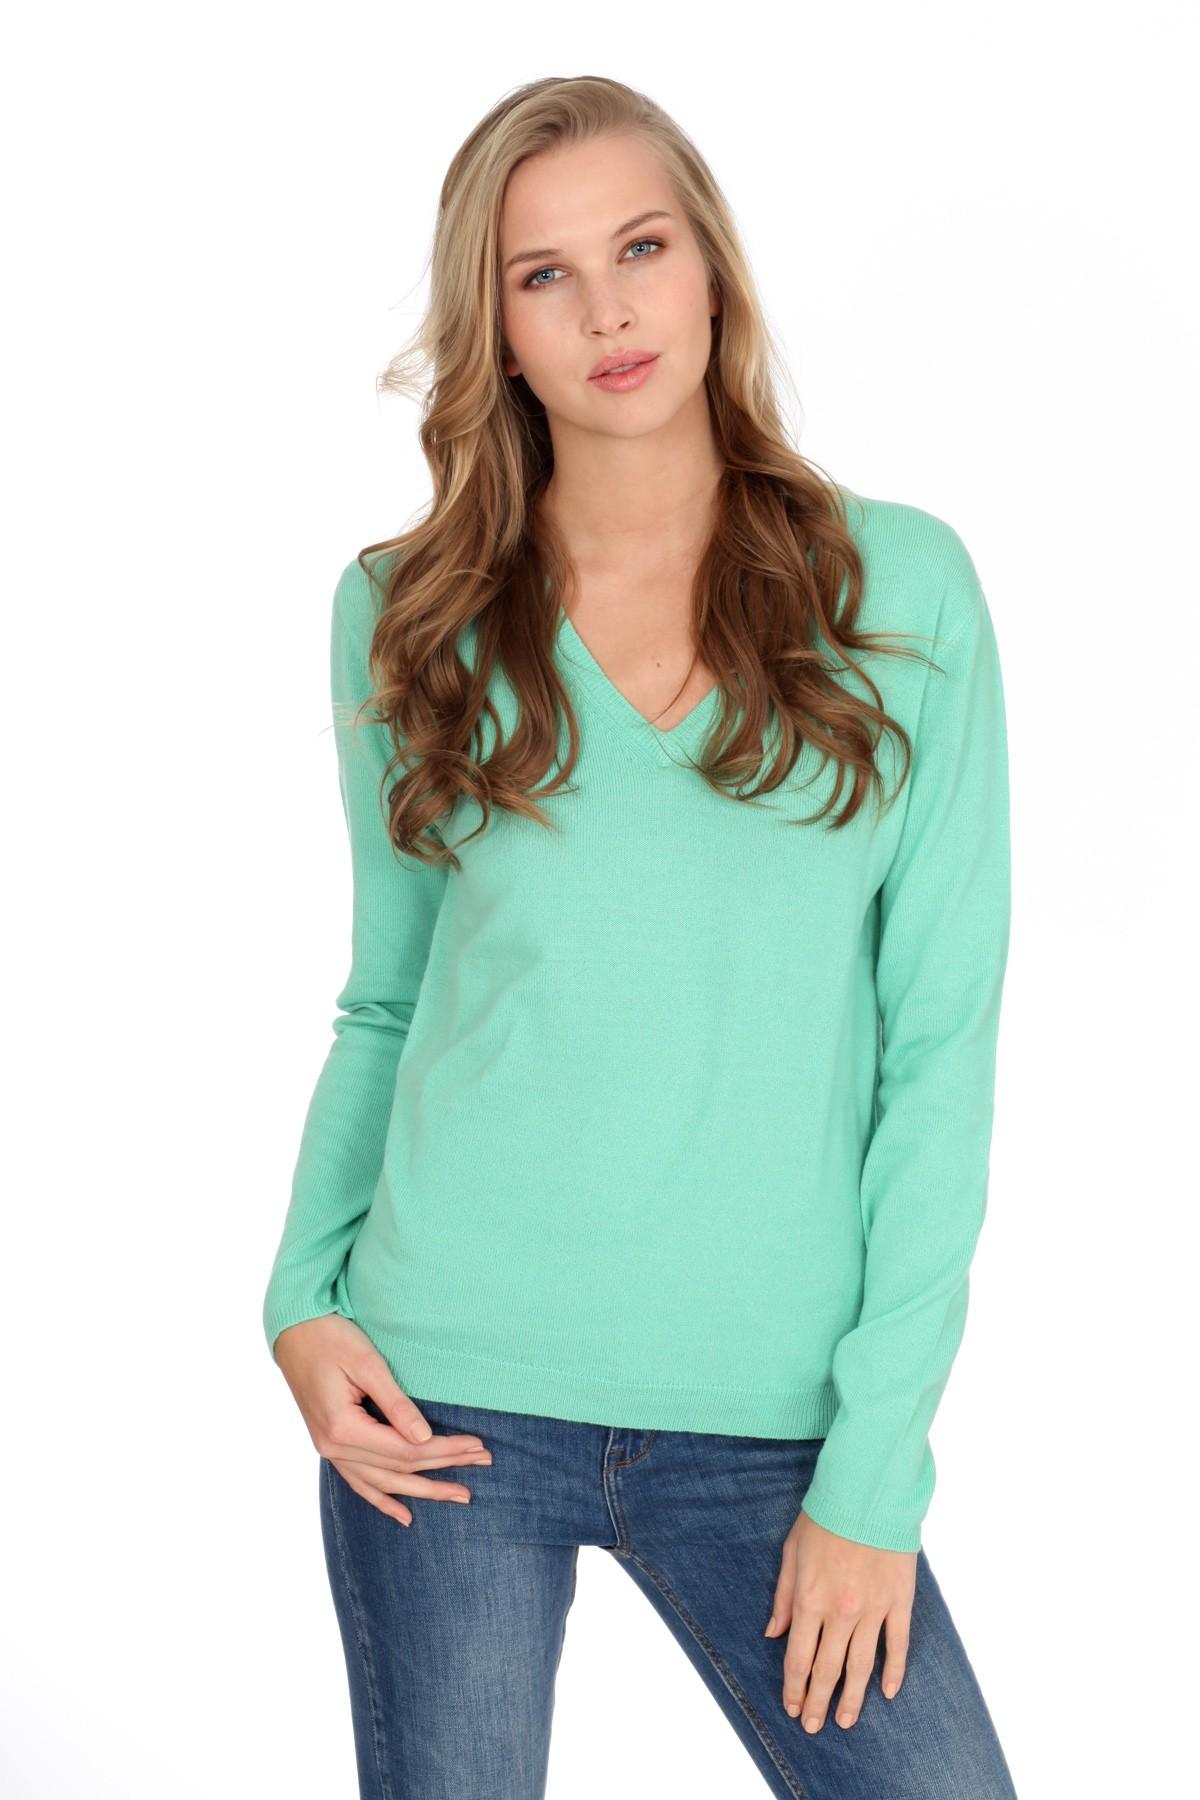 Women's cashmere V-neck sweater mint